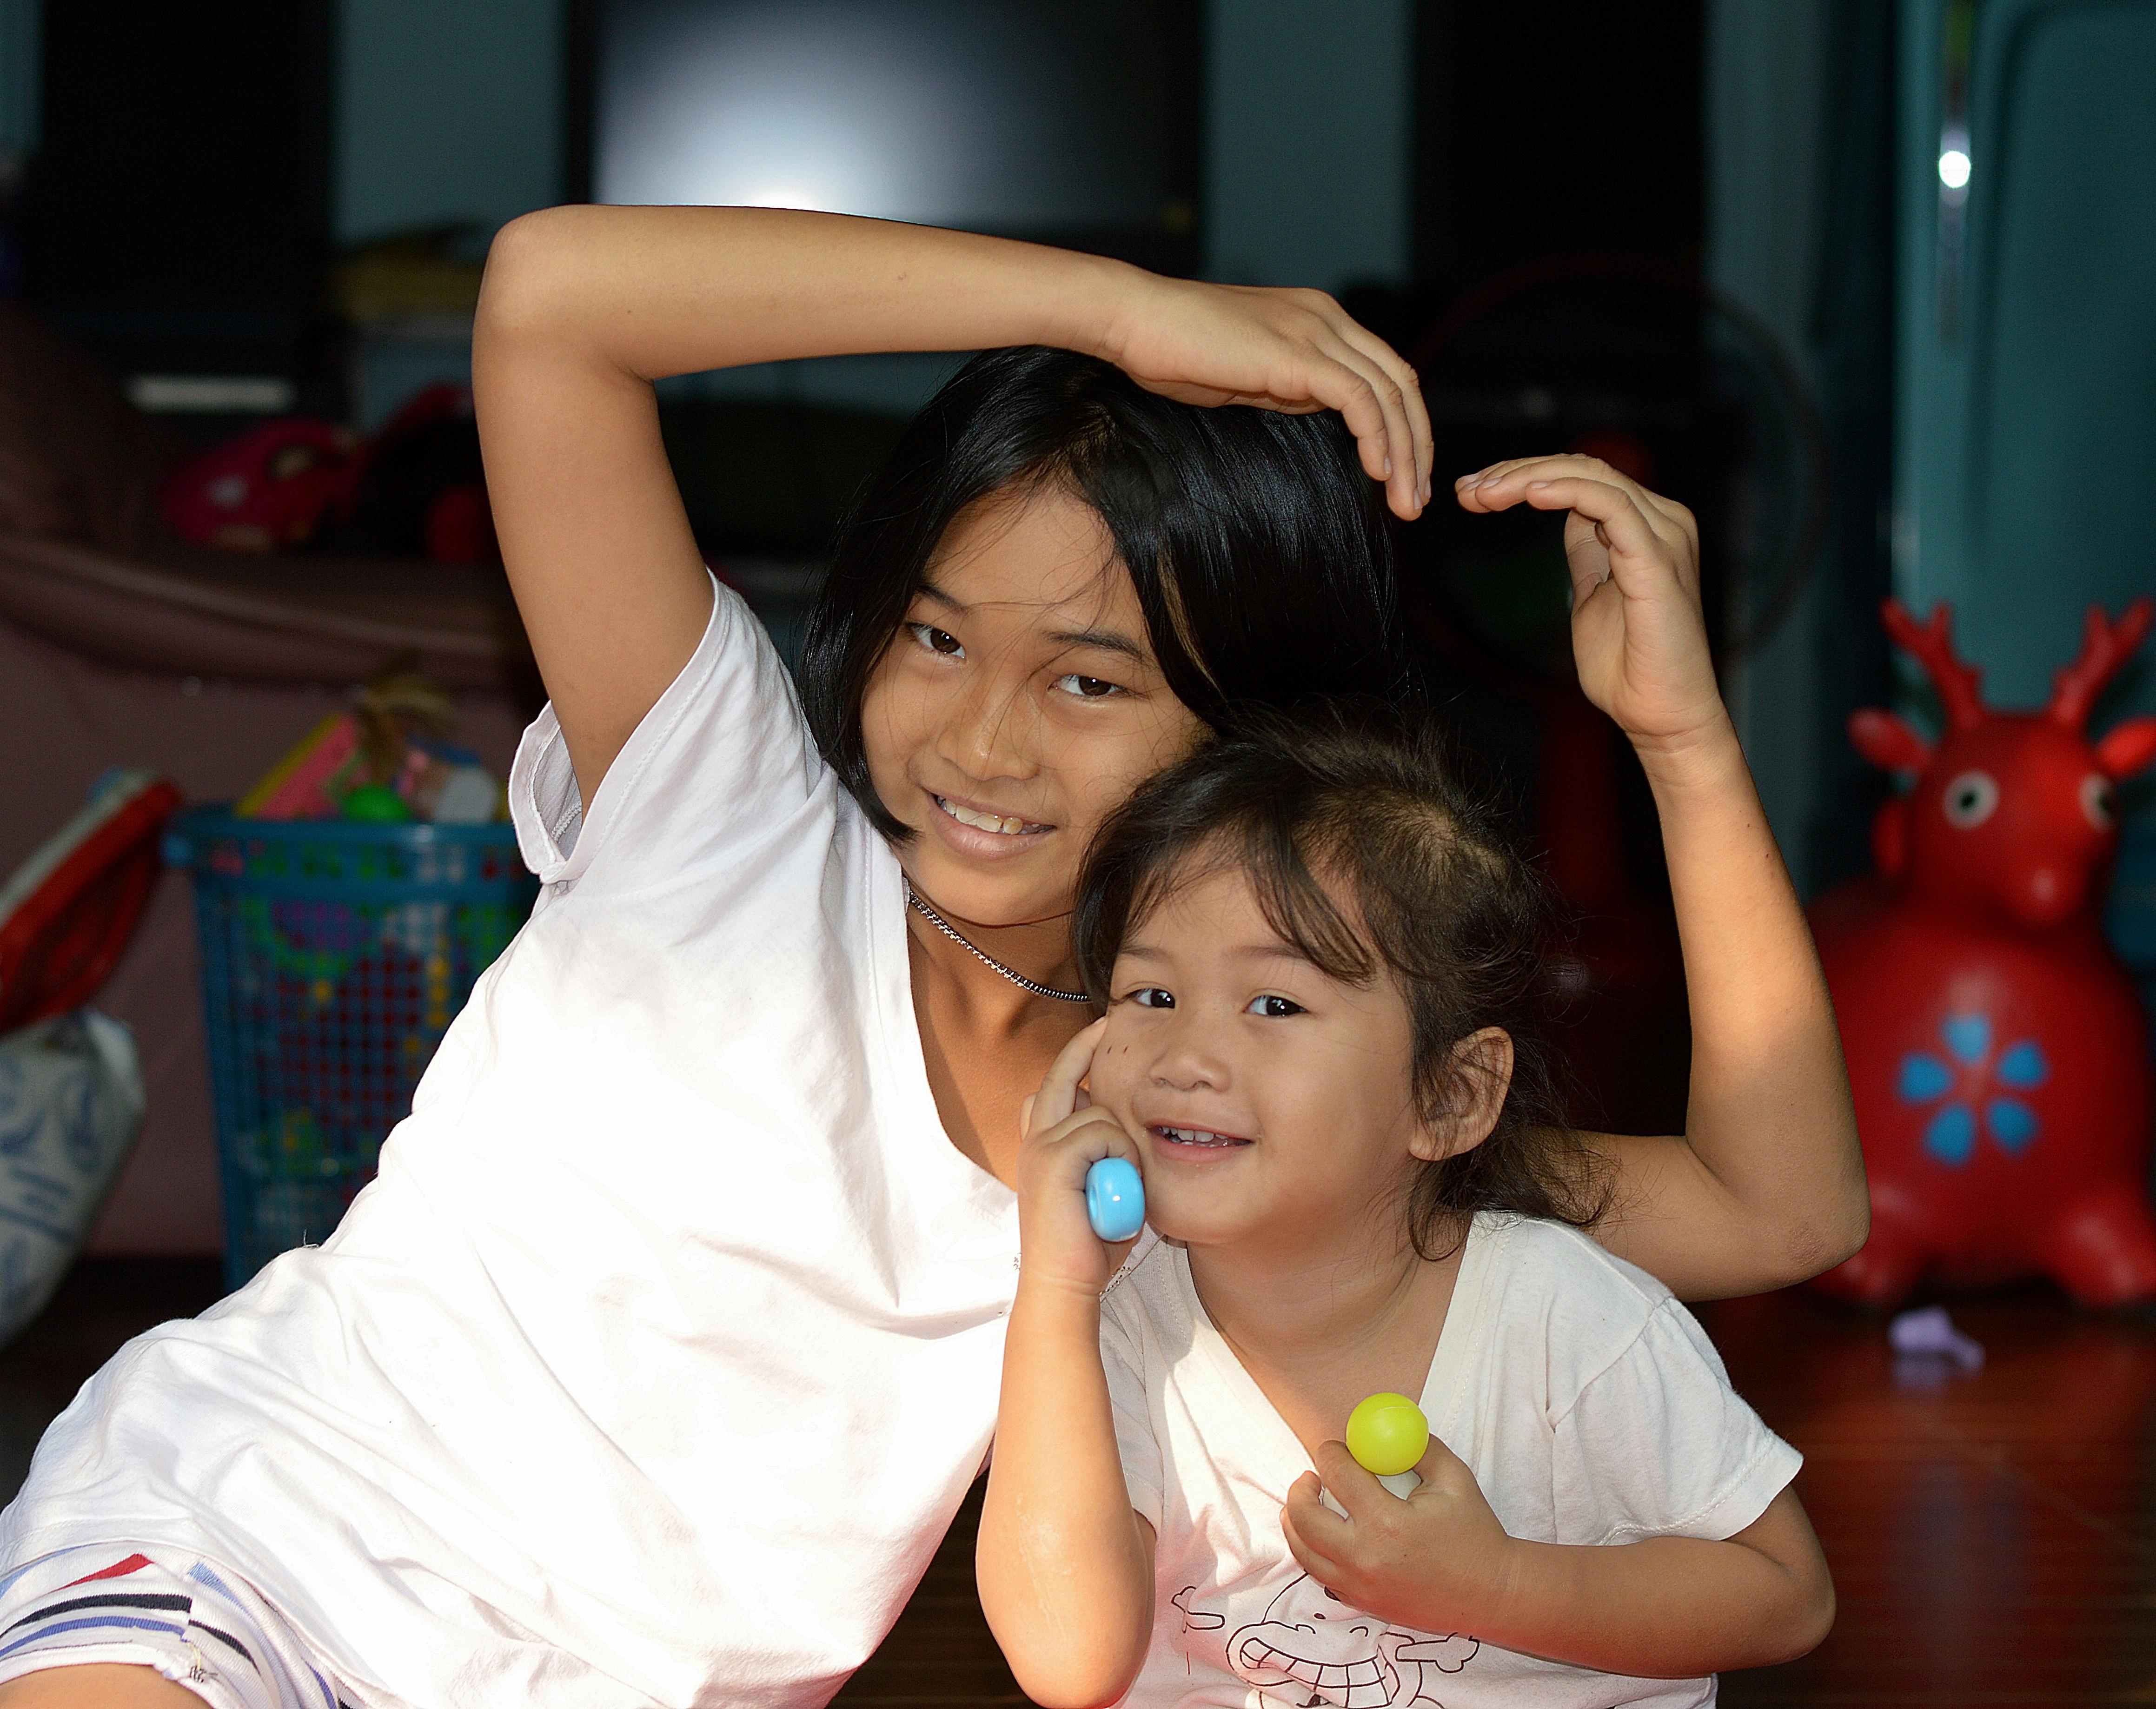 thailand party girls